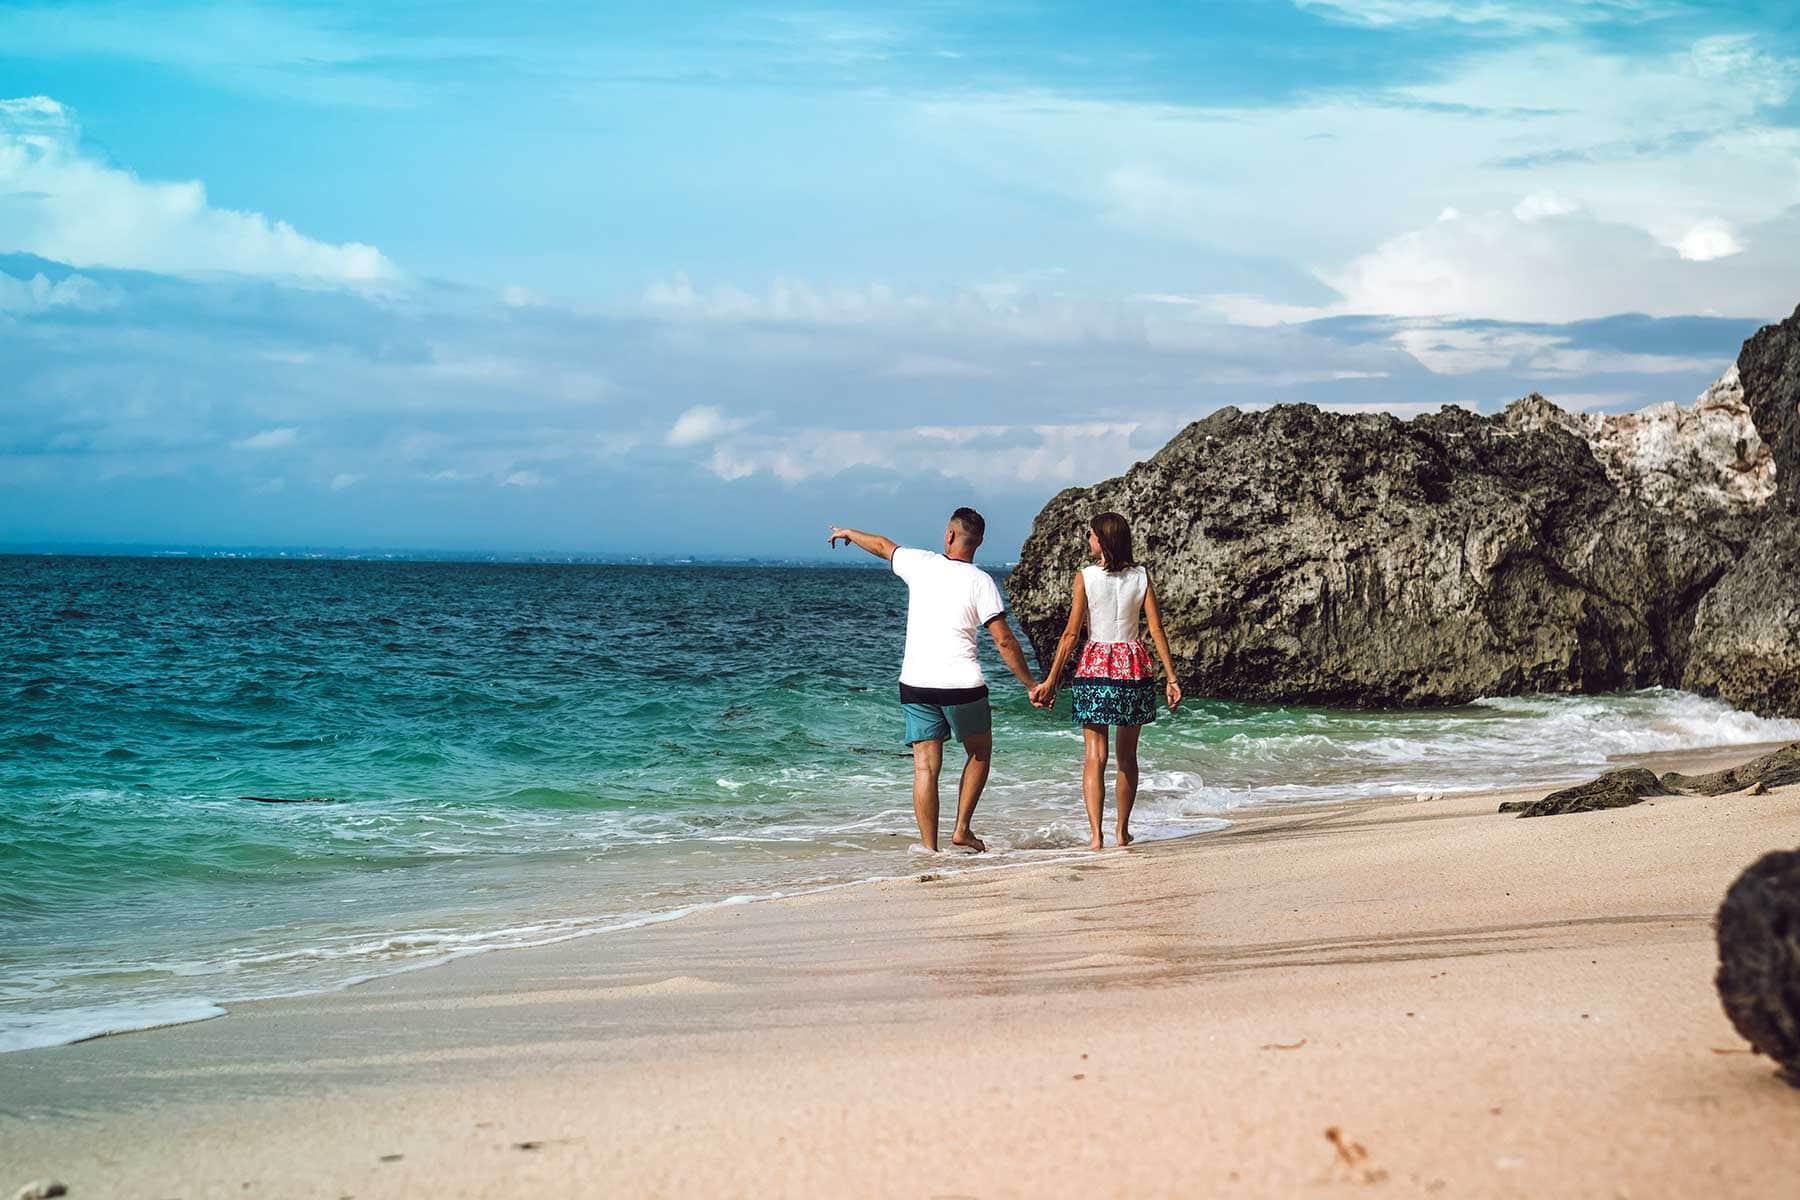 Resor-till-Bali-med-Nygren-&-Lind-Resebyrå---par-på-strand